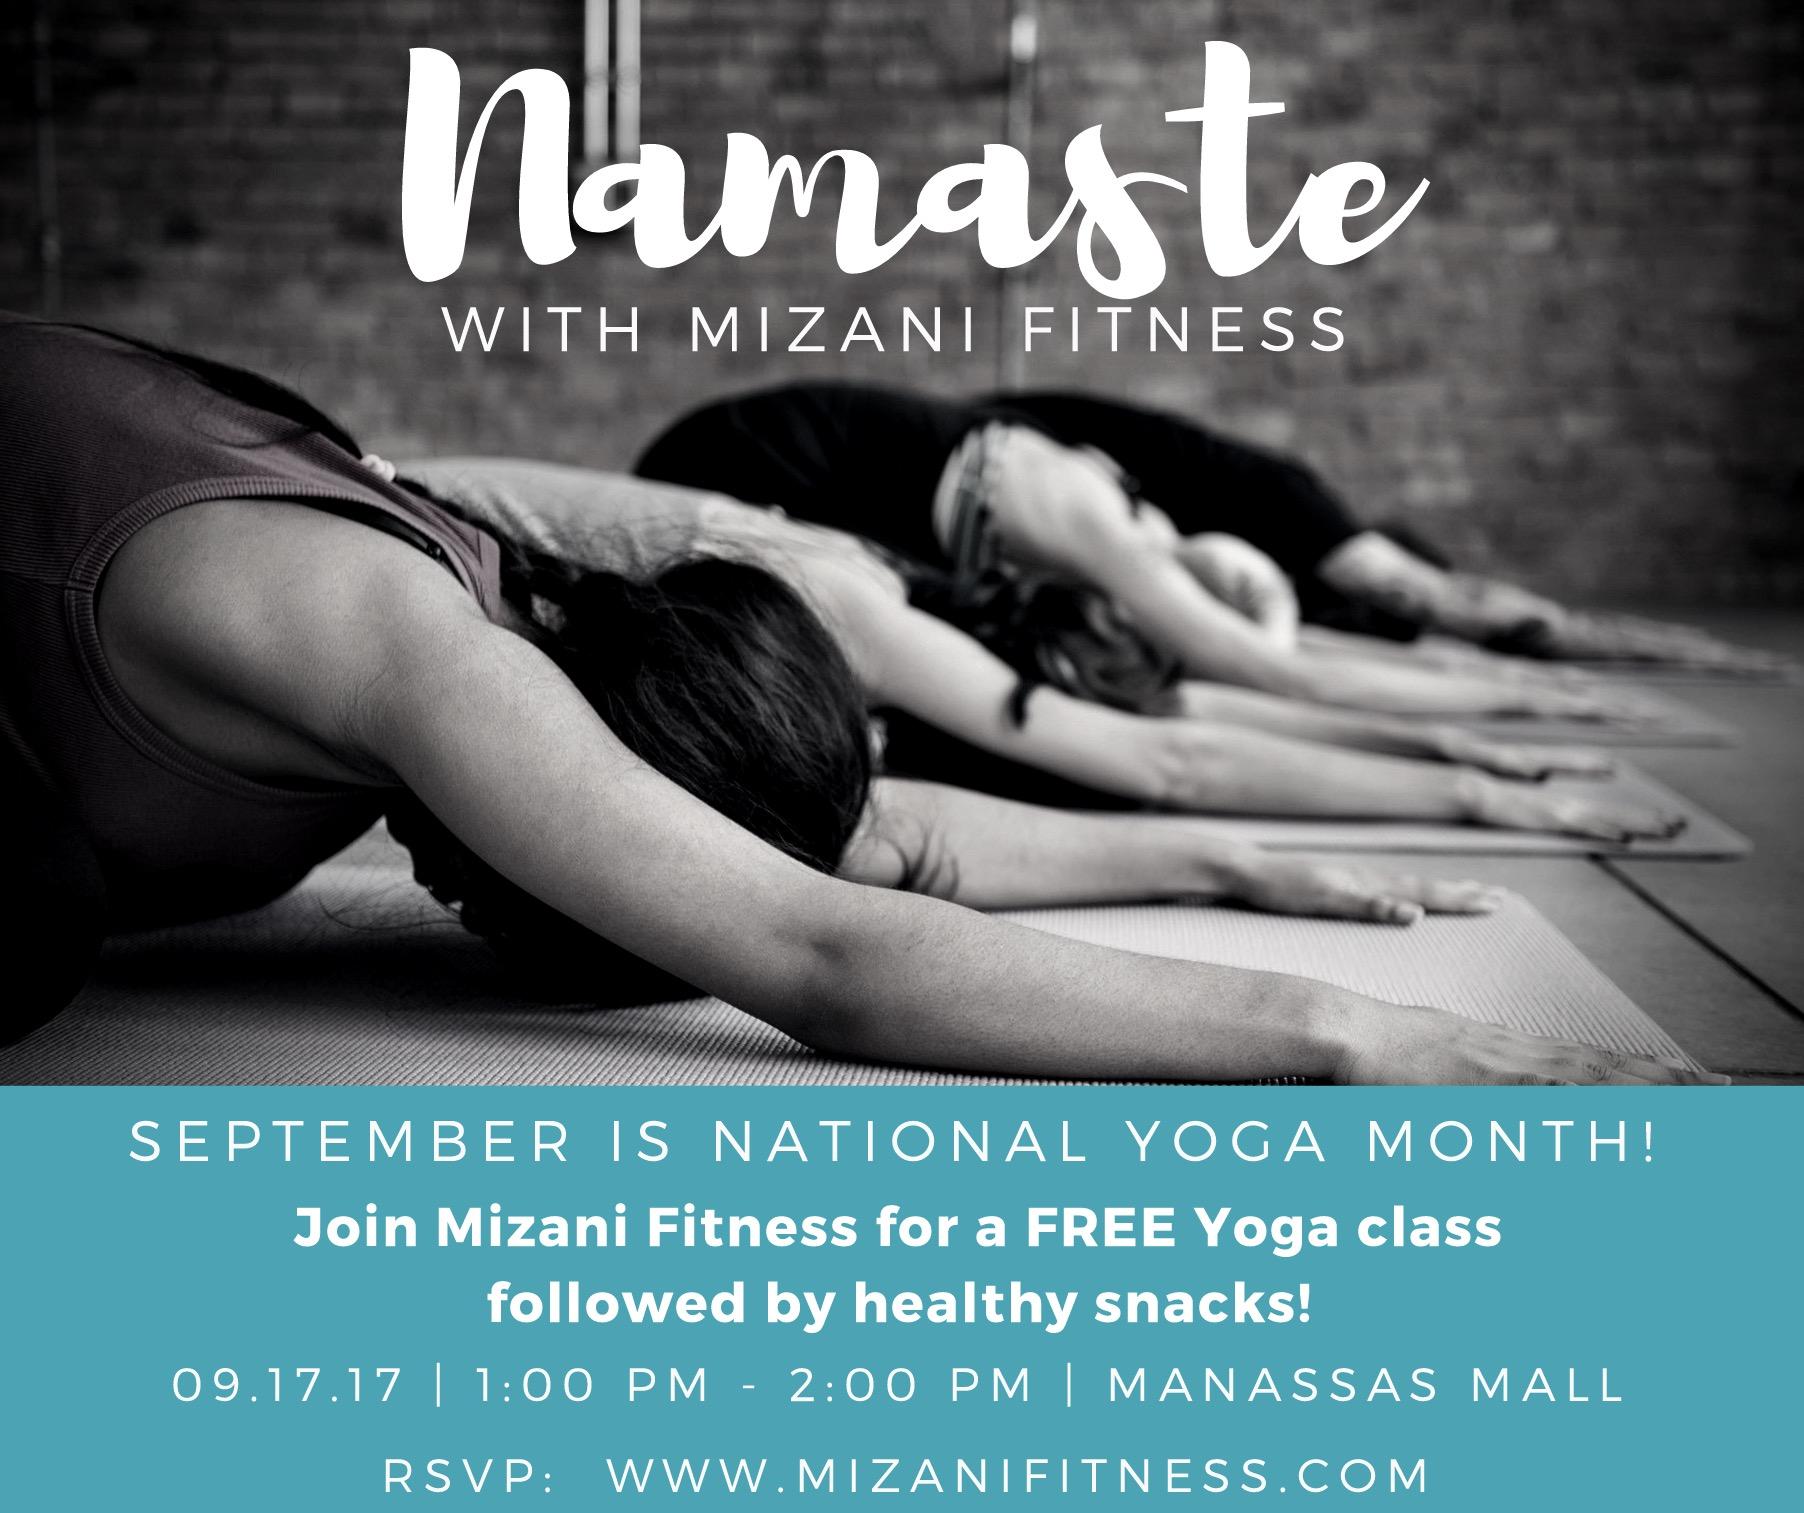 Namaste with Mizani Fitness